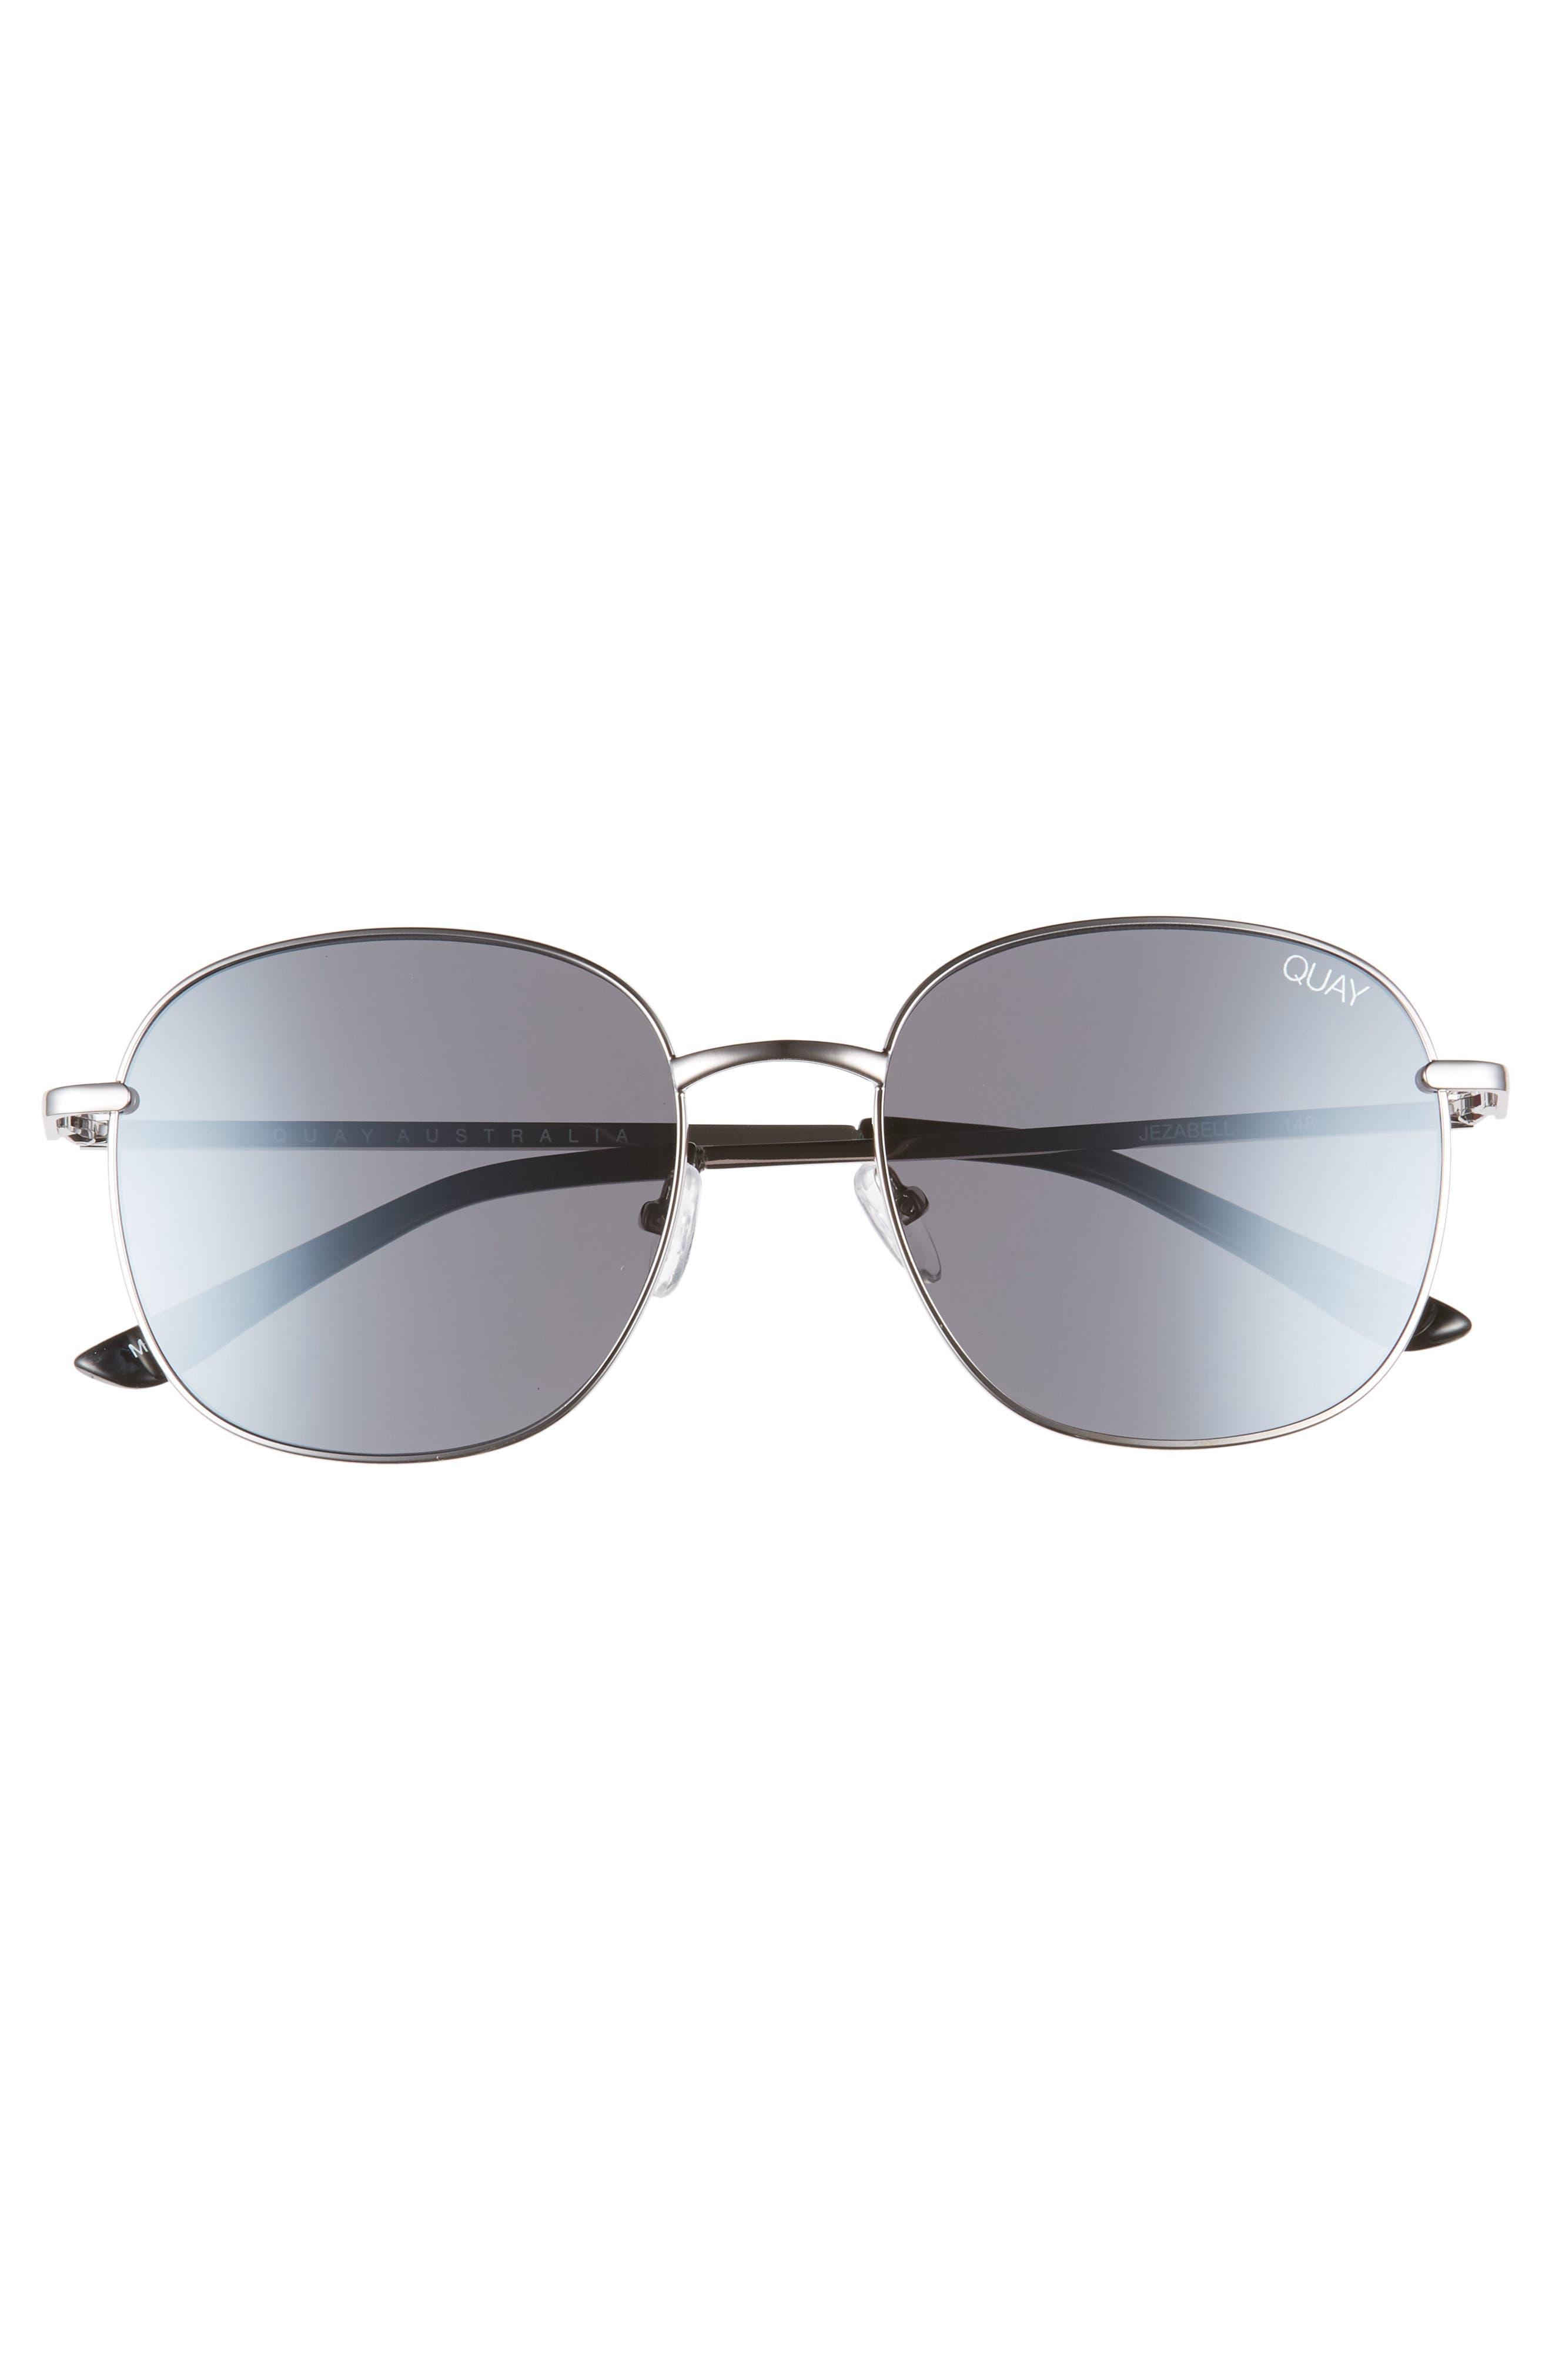 QUAY AUSTRALIA, Jezabell 57mm Round Sunglasses, Alternate thumbnail 3, color, GUNMETAL / SILVER MIRROR